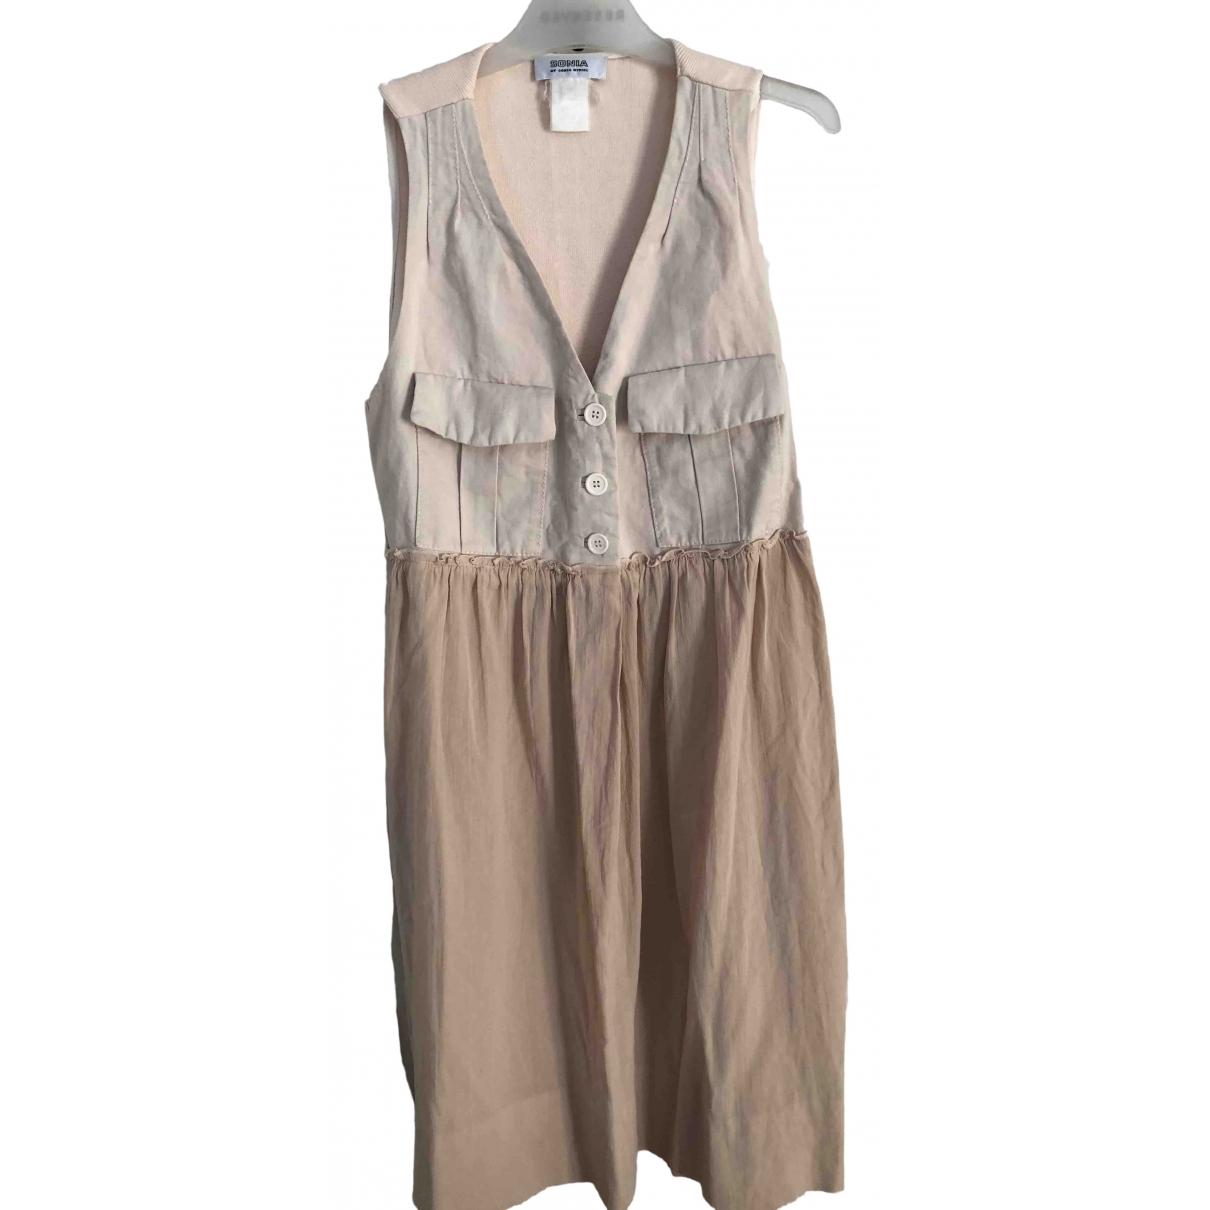 Sonia By Sonia Rykiel \N Beige Cotton dress for Women 40 FR